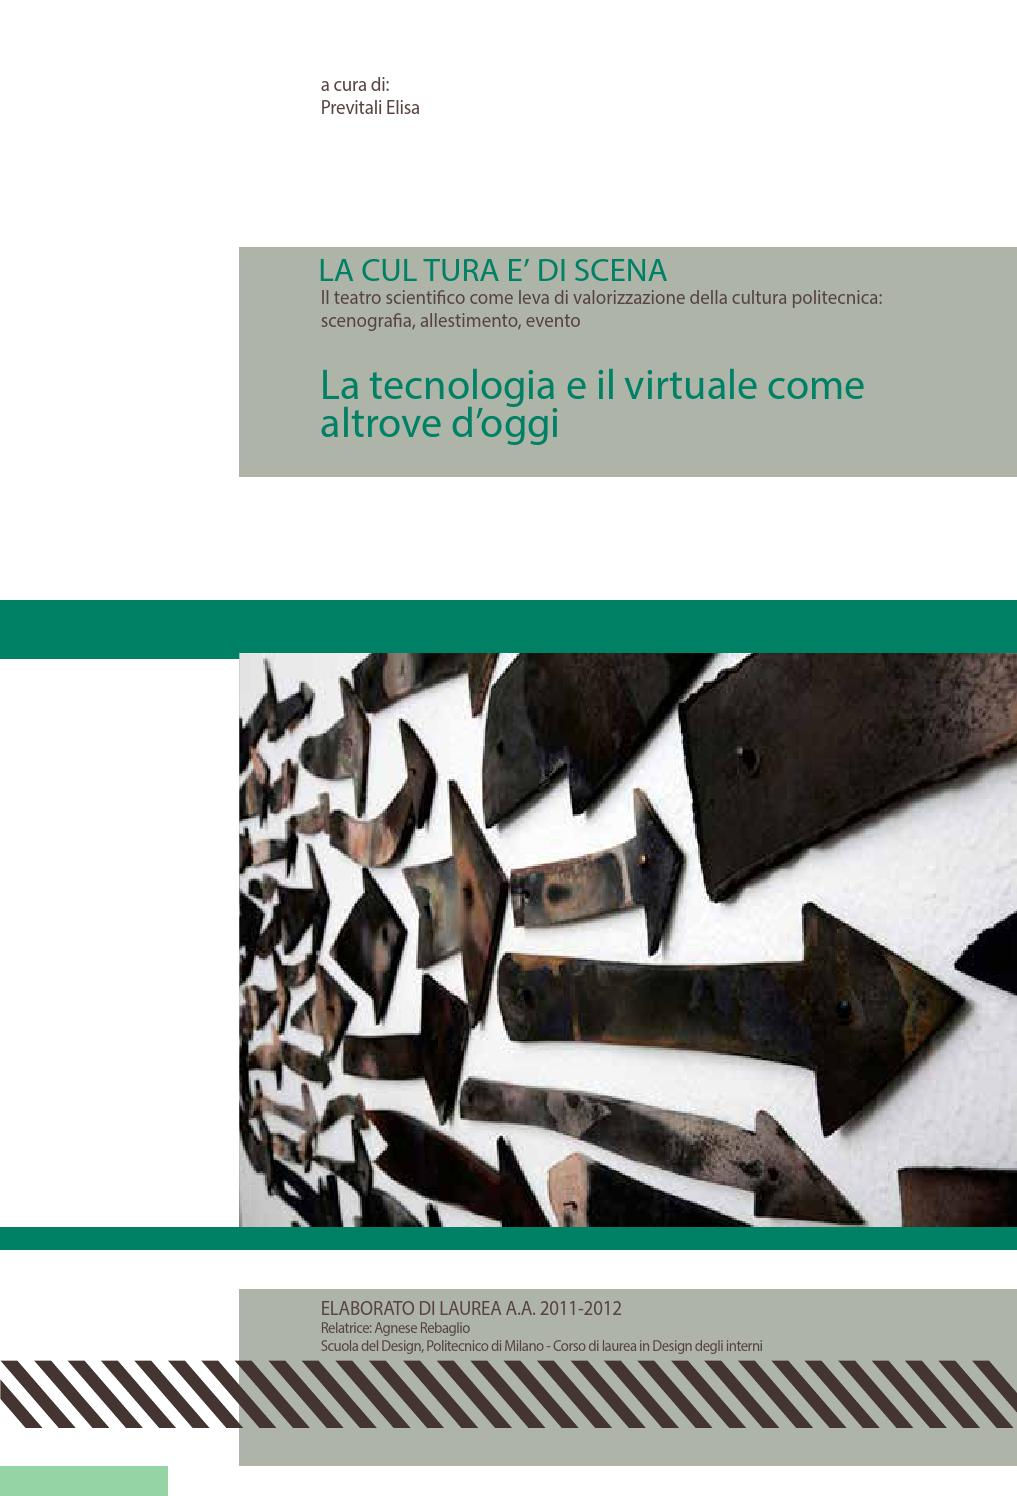 Tesi di laurea by elisa previtali issuu for Laurea design milano